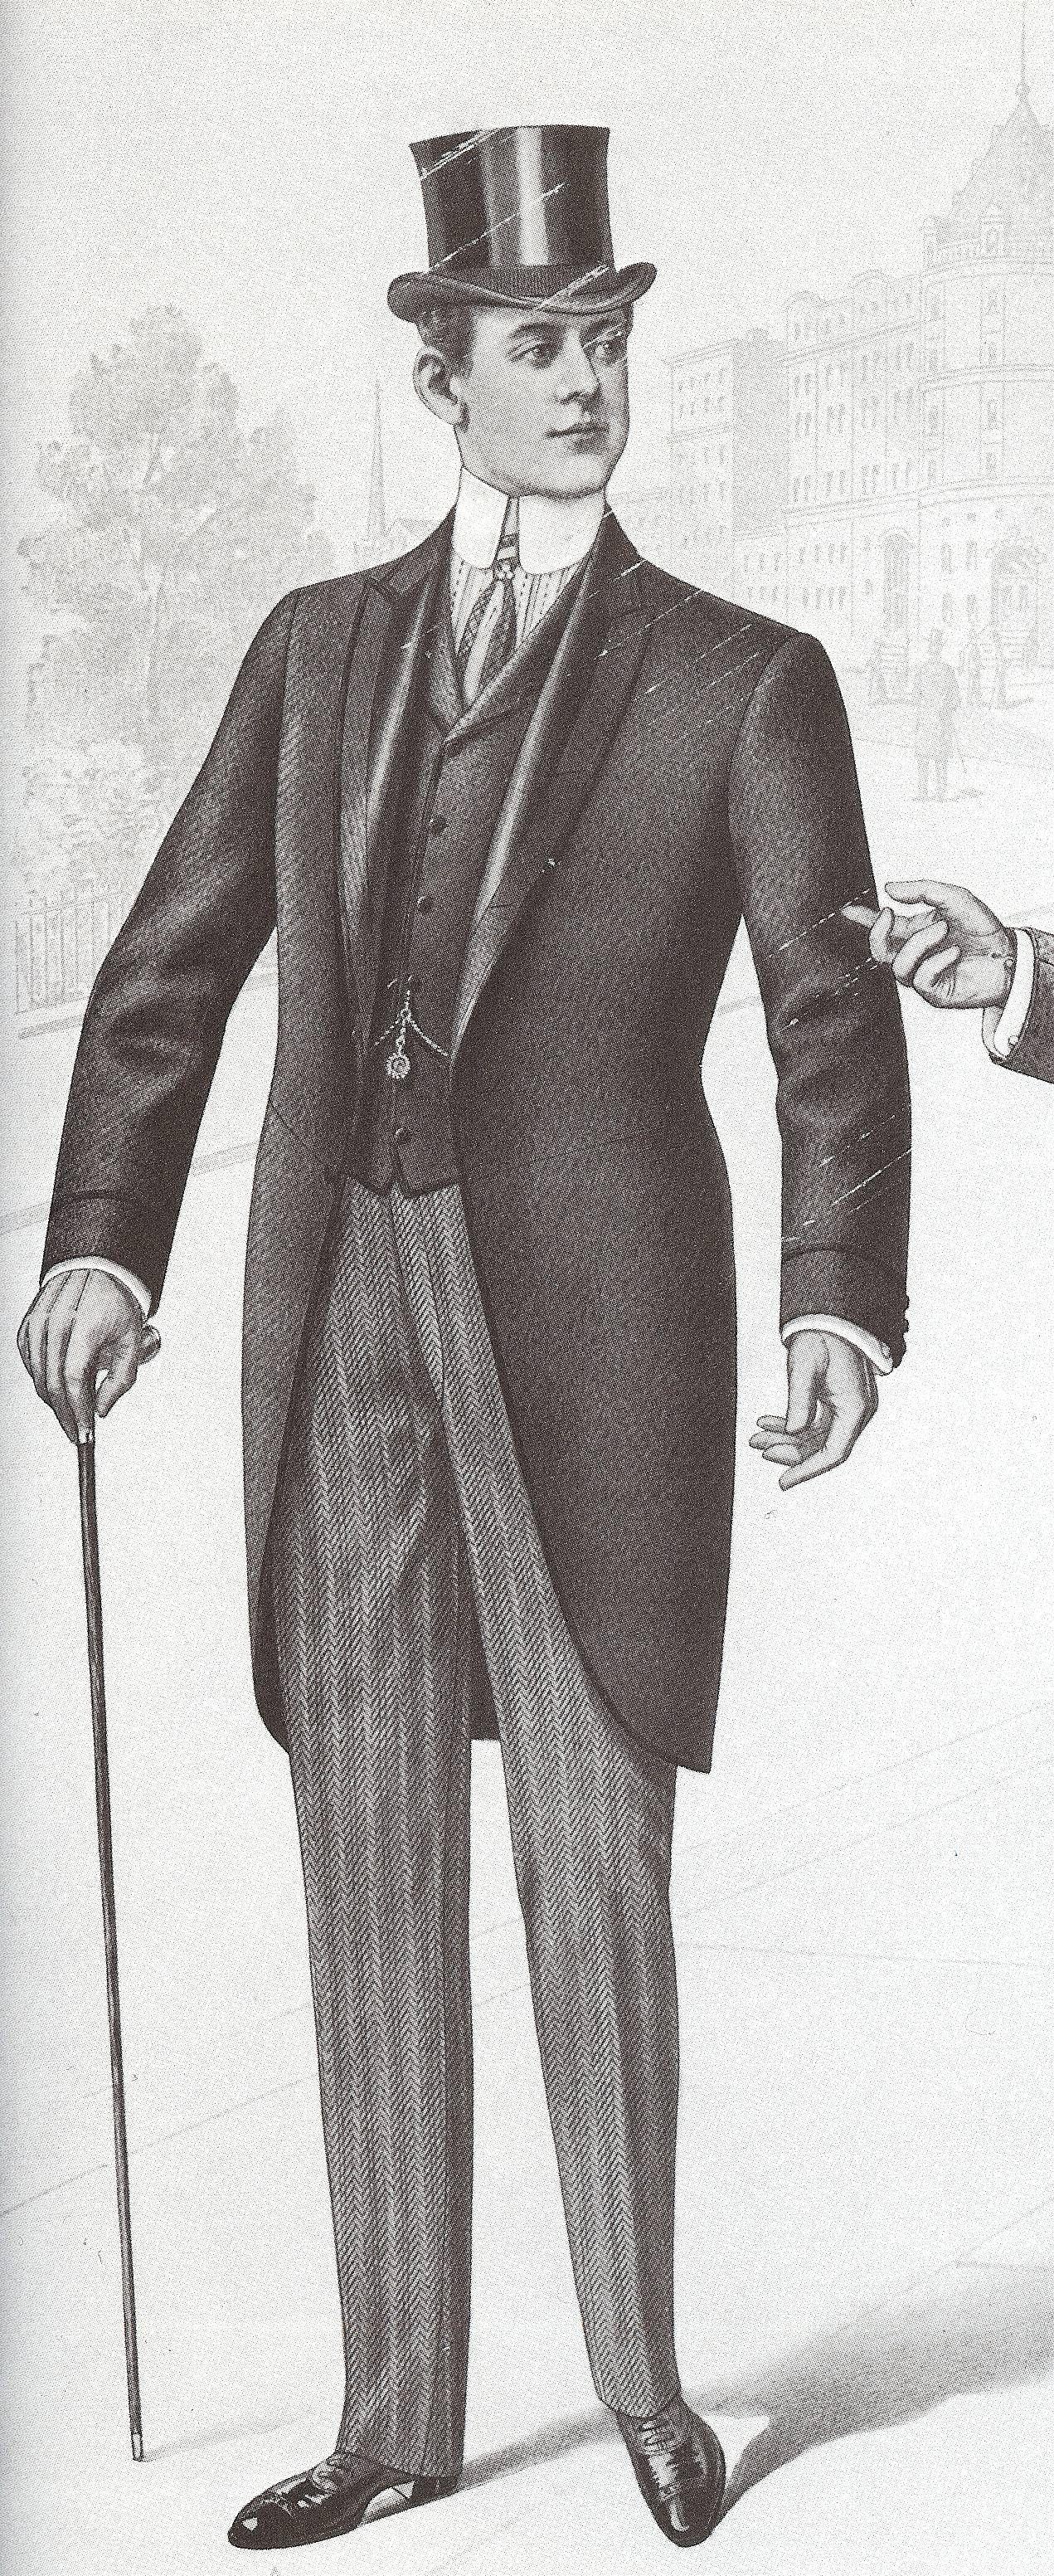 bd709f89d 1901, a man in a morning coat. | ART in 2019 | Morning coat, Coat ...